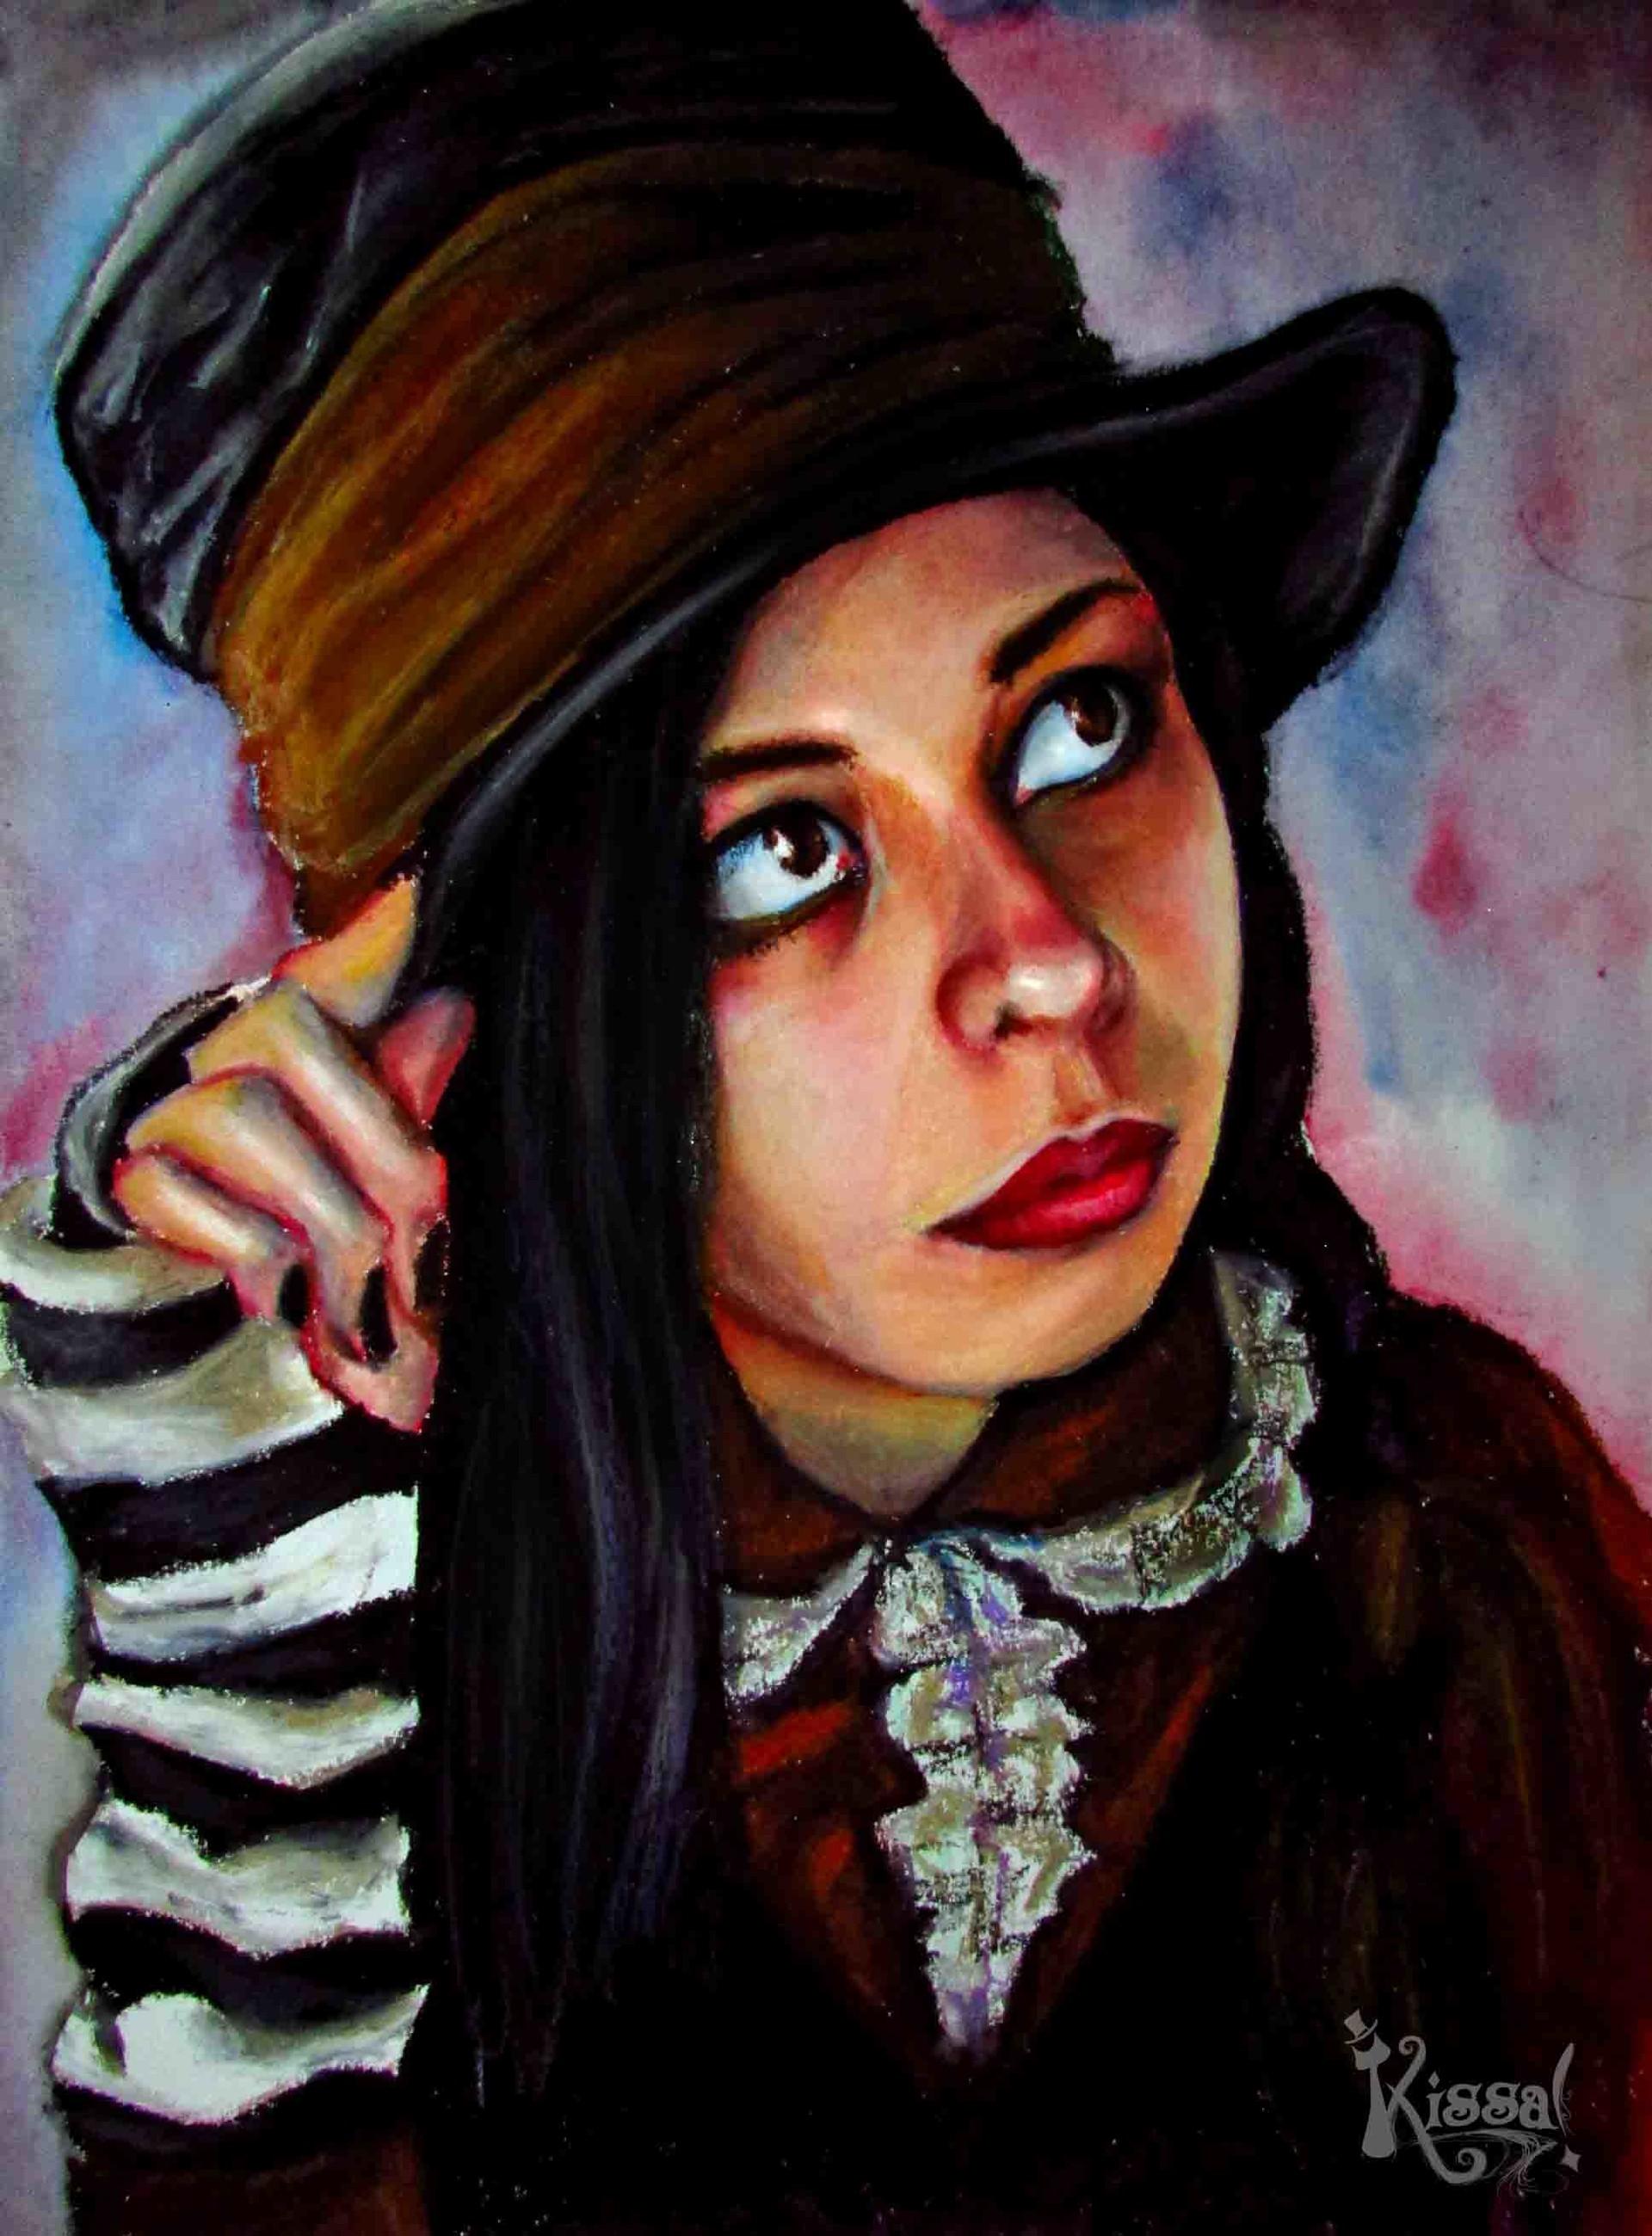 Kissa marana 20150330 autoretrato pastel graso